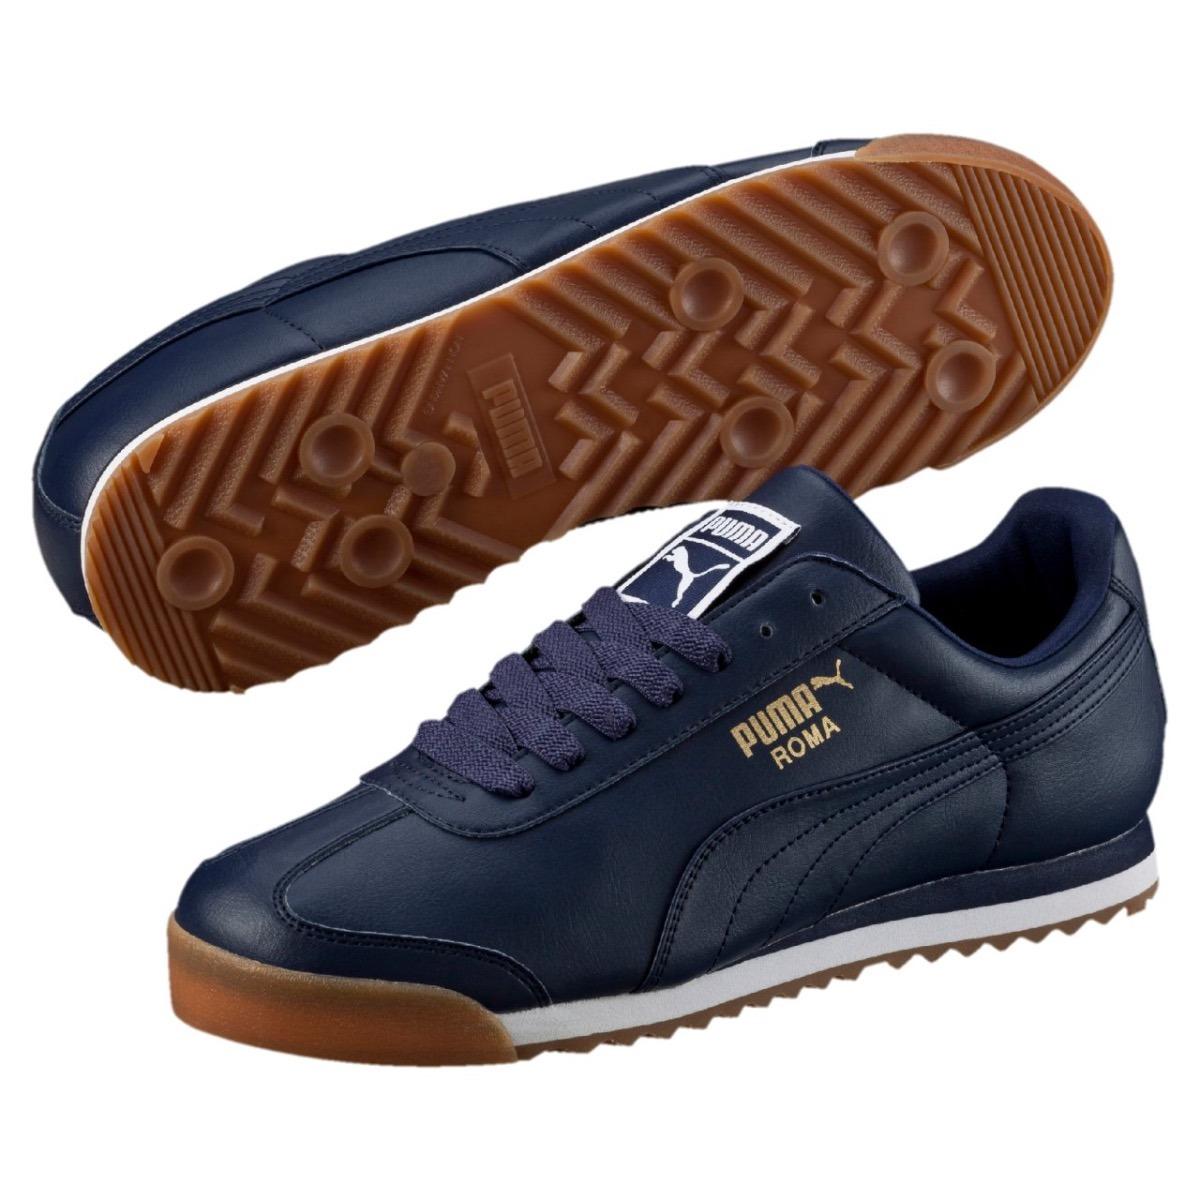 4088f1244 tenis puma roma azul marino hombre 353572-59 look trendy. Cargando zoom.